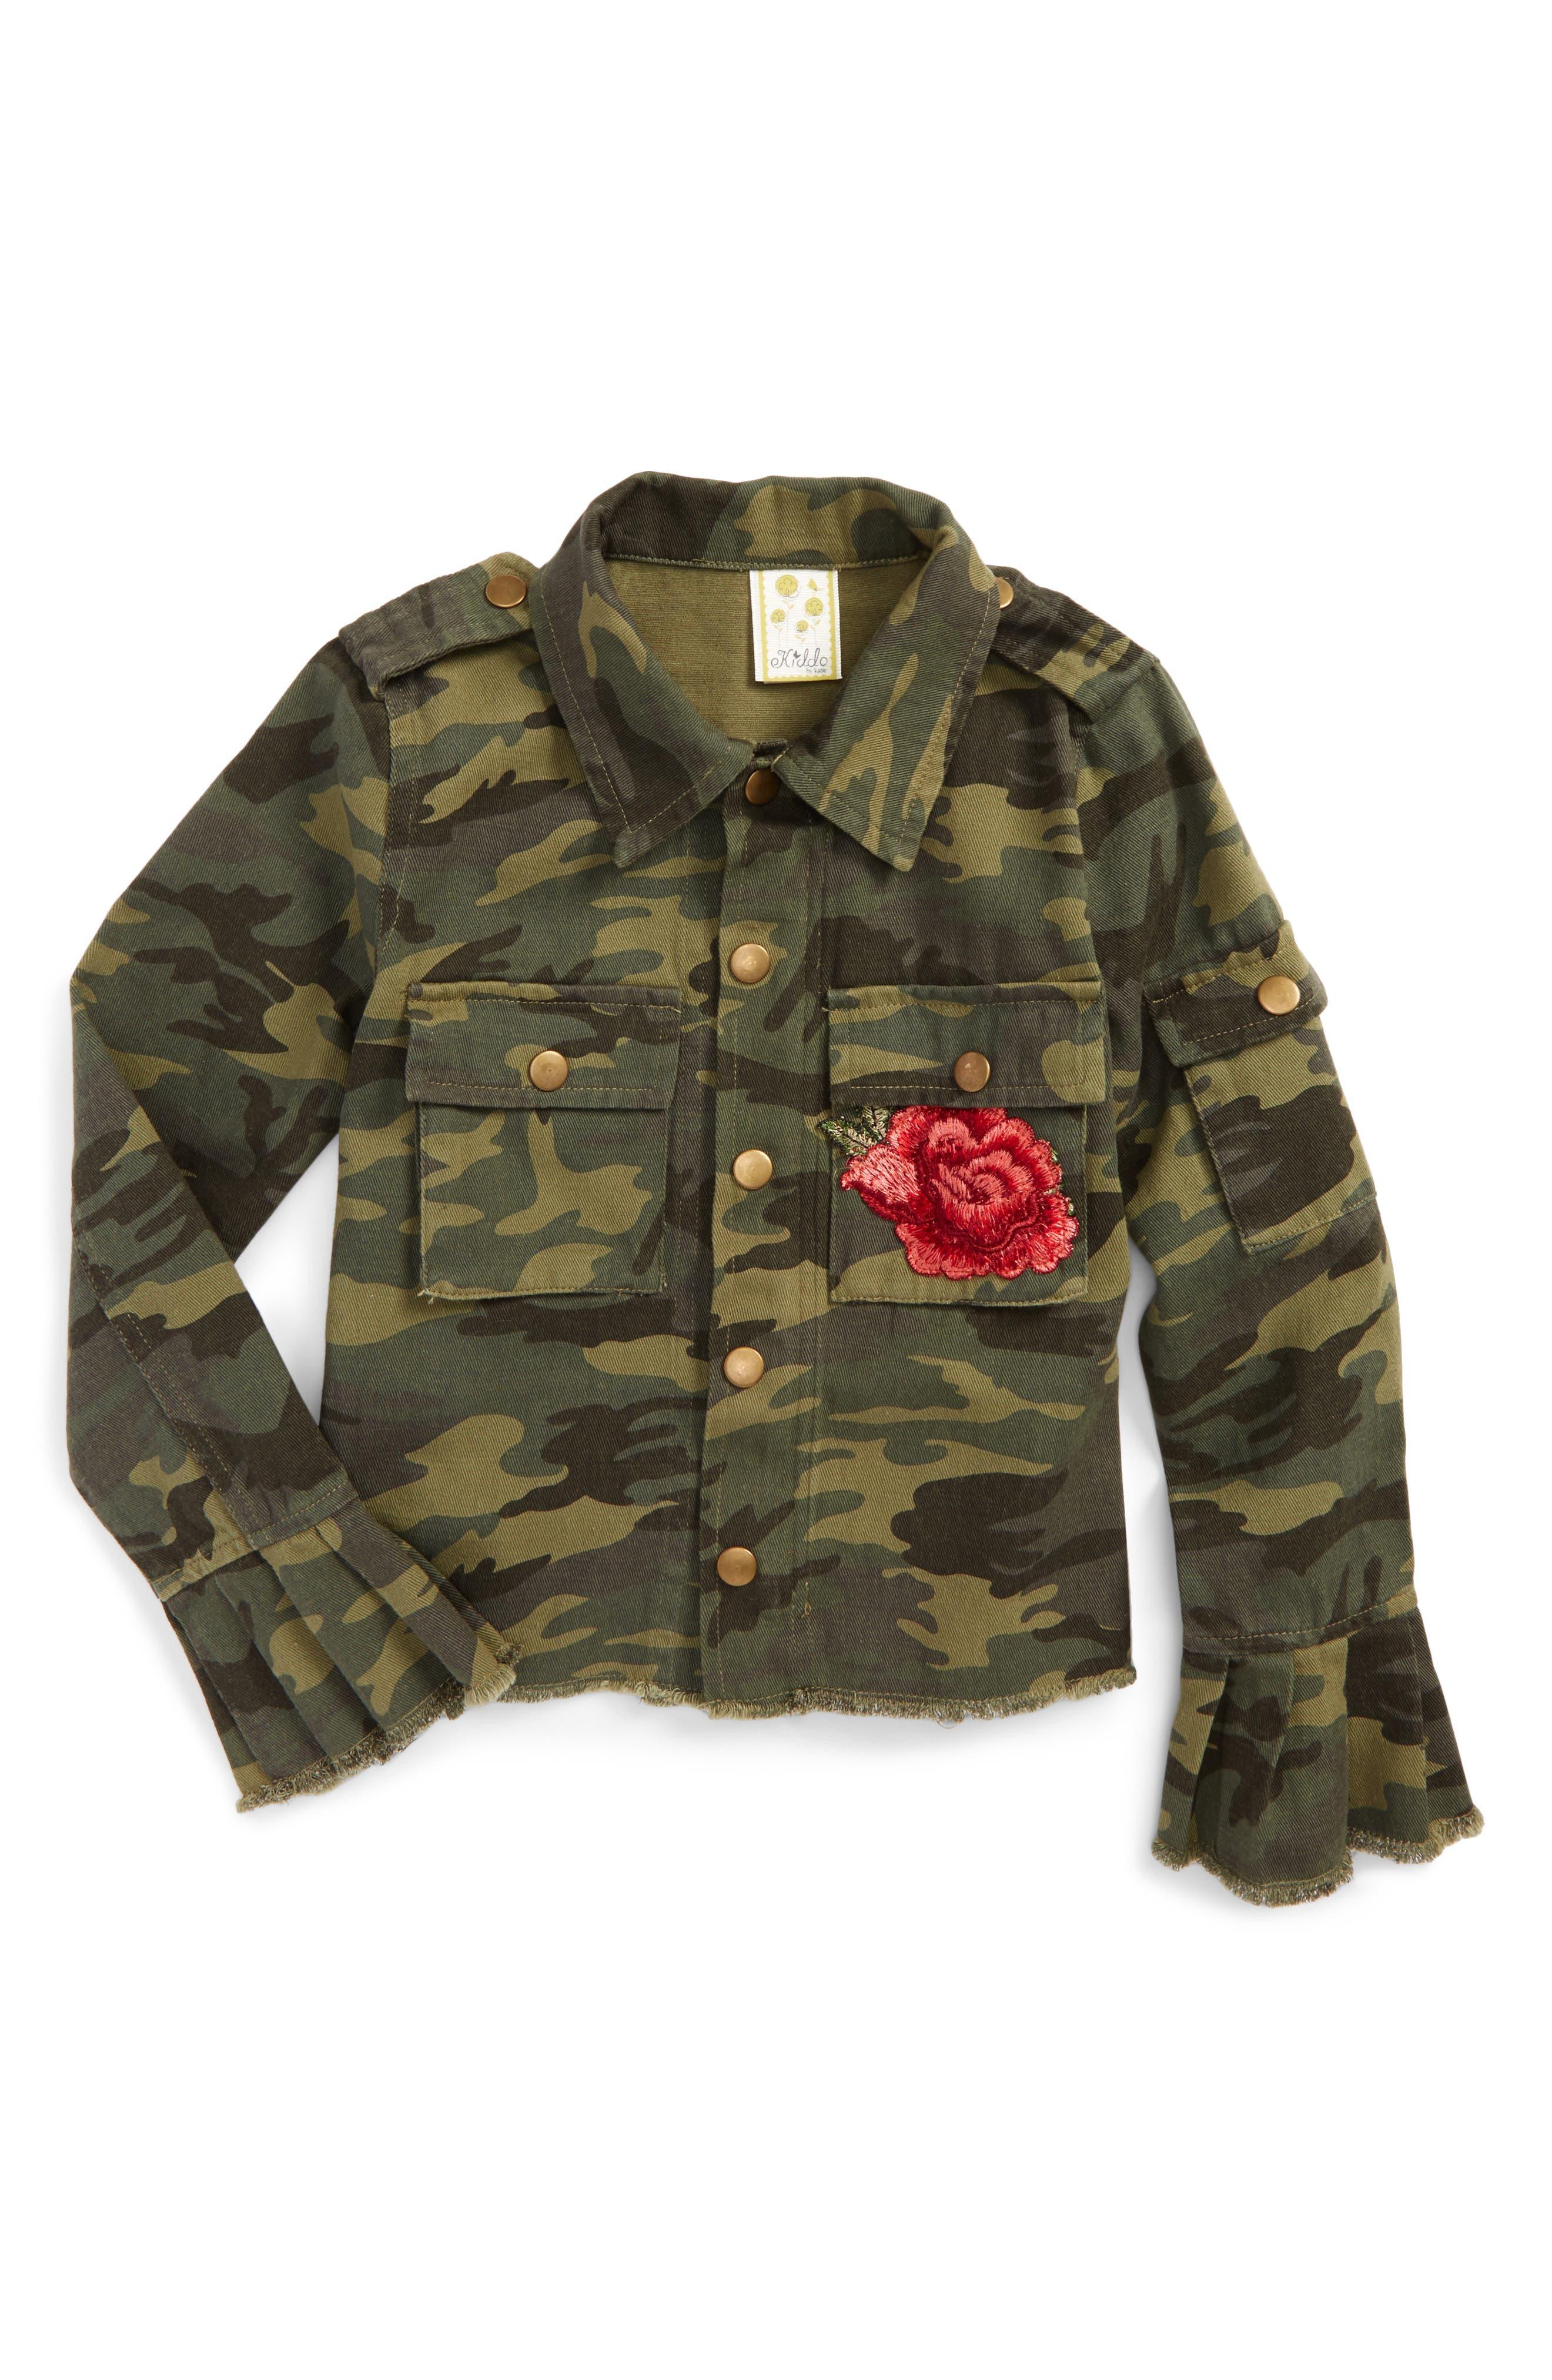 Alternate Image 1 Selected - Kiddo Embroidered Camo Shirt Jacket (Big Girls)